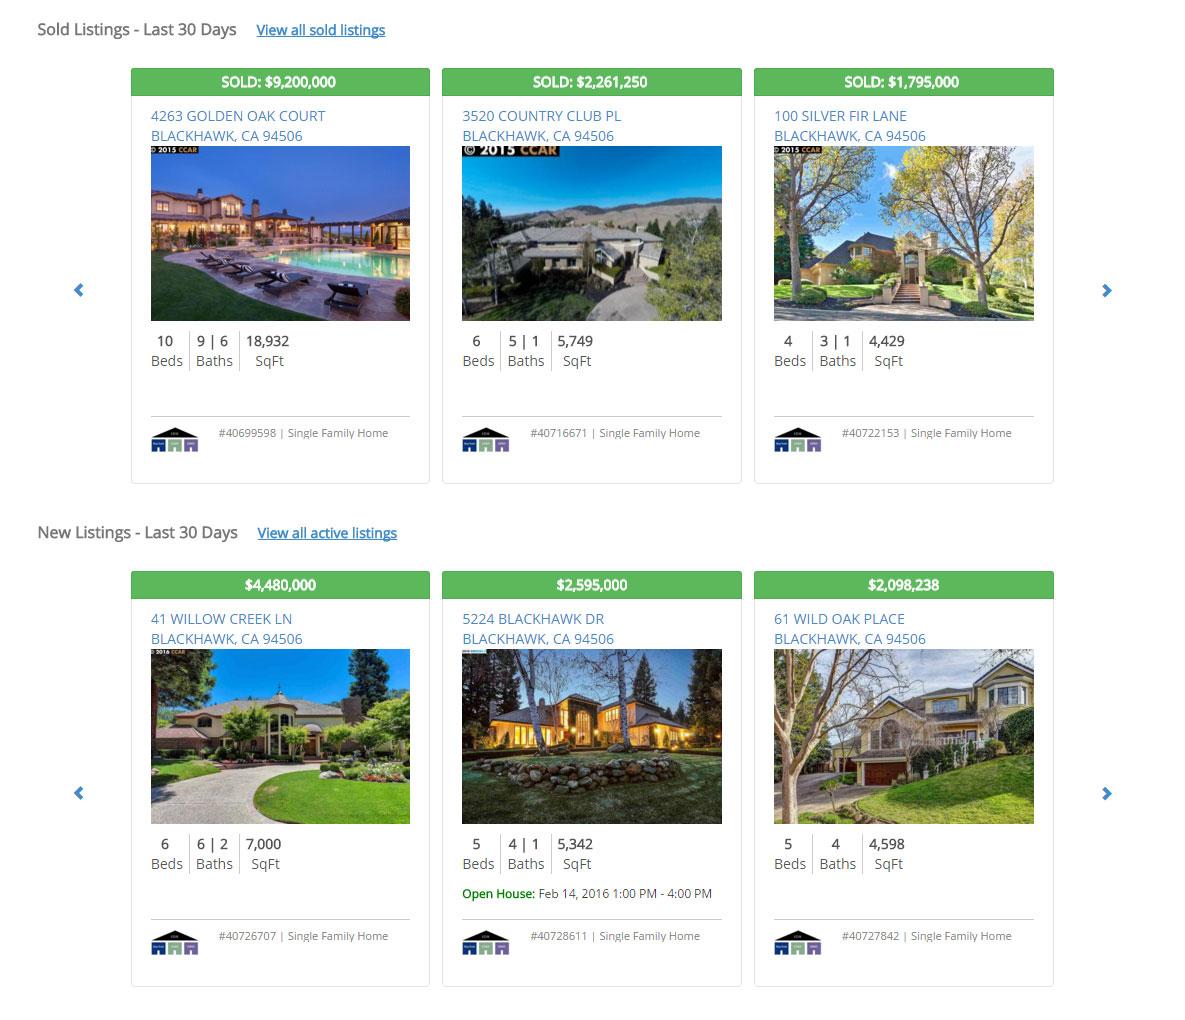 marketboost-ihomefinder-listings-report